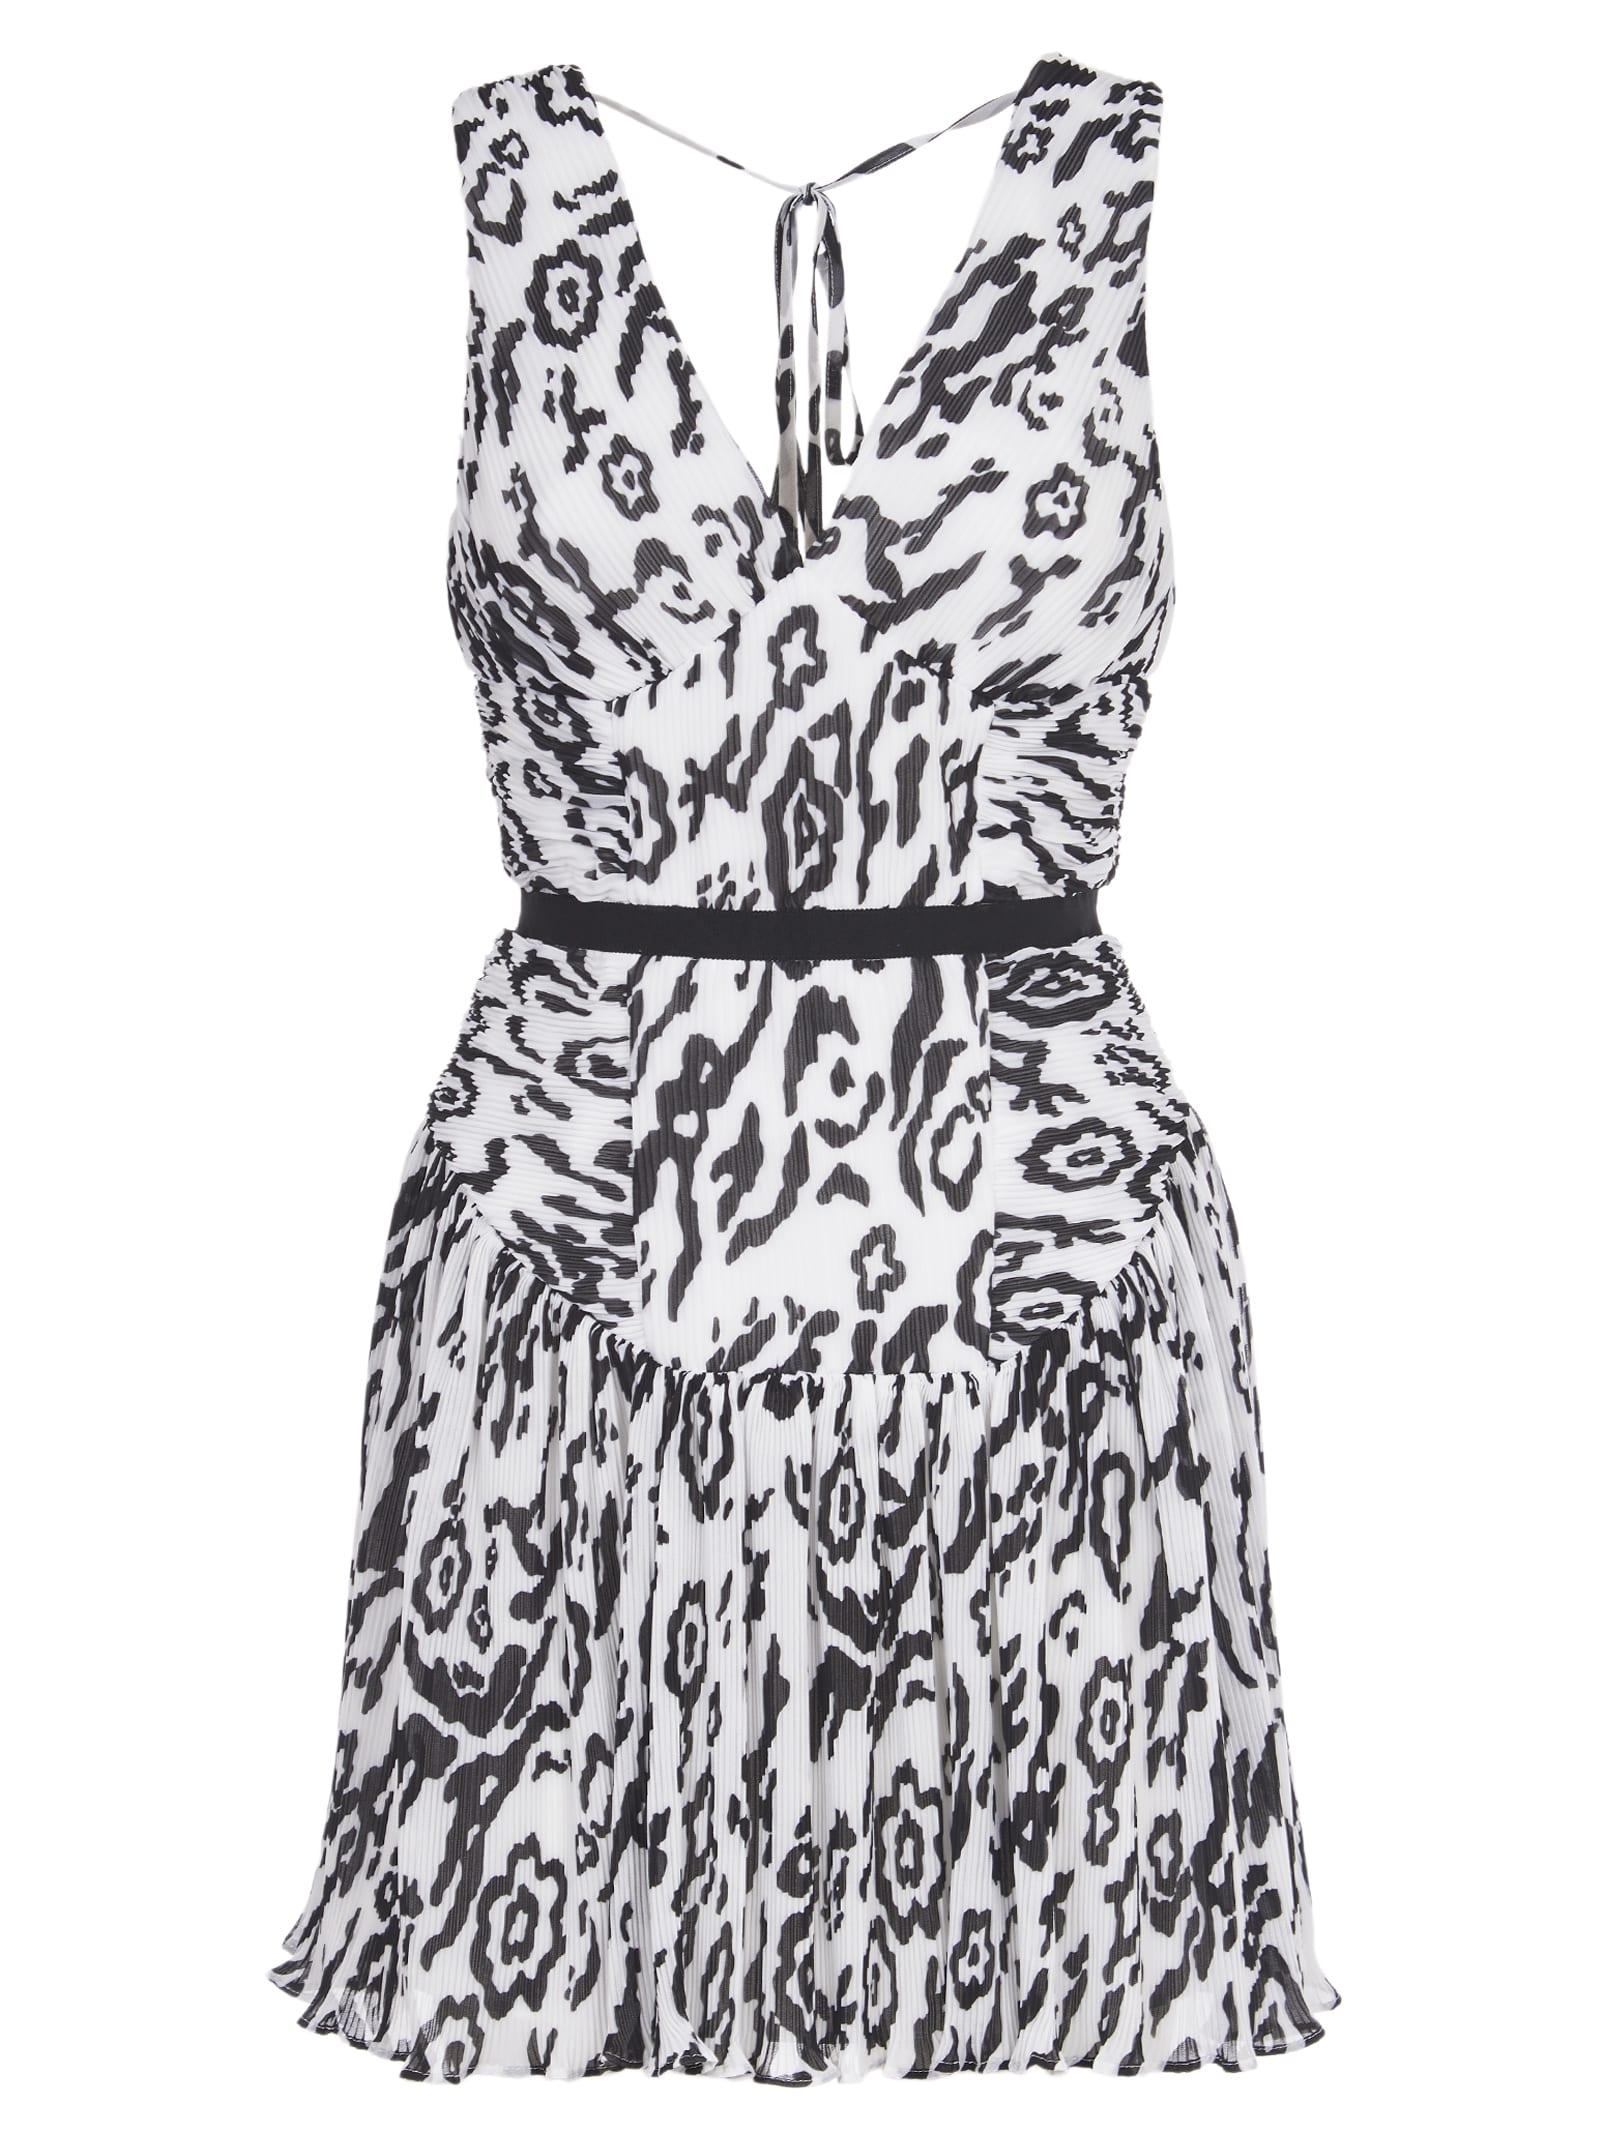 self-portrait Mini Dress Black And White Animal Print